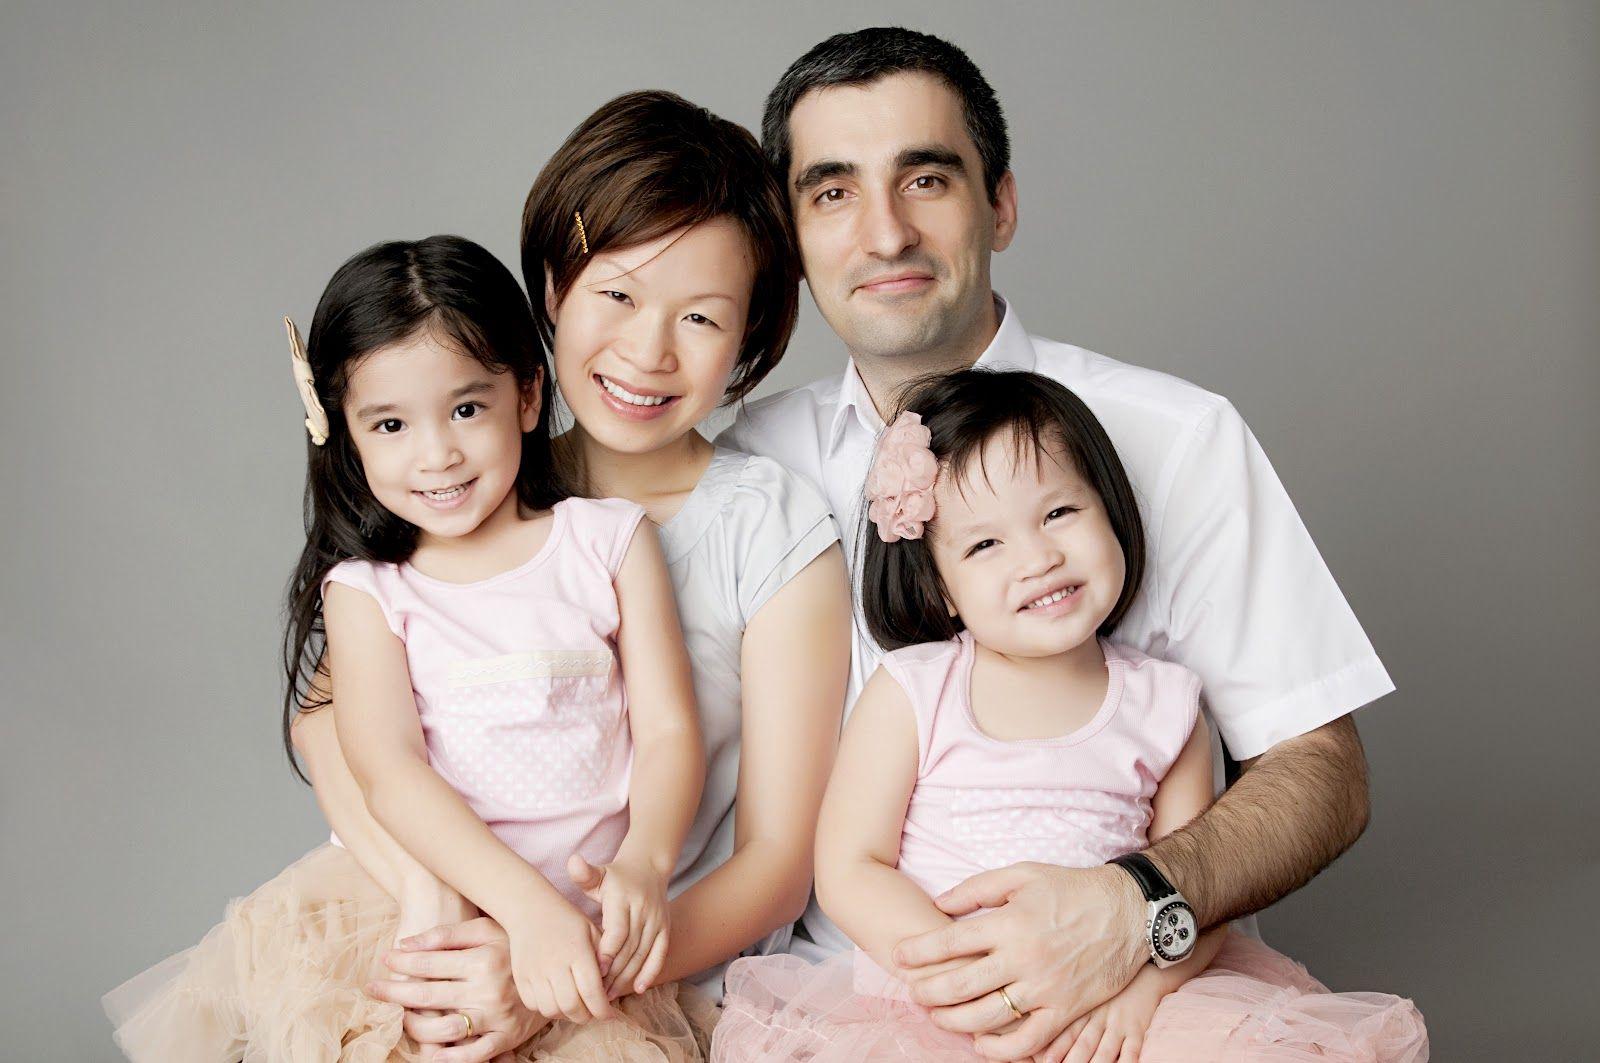 Family studio portrait ideas what to wear images